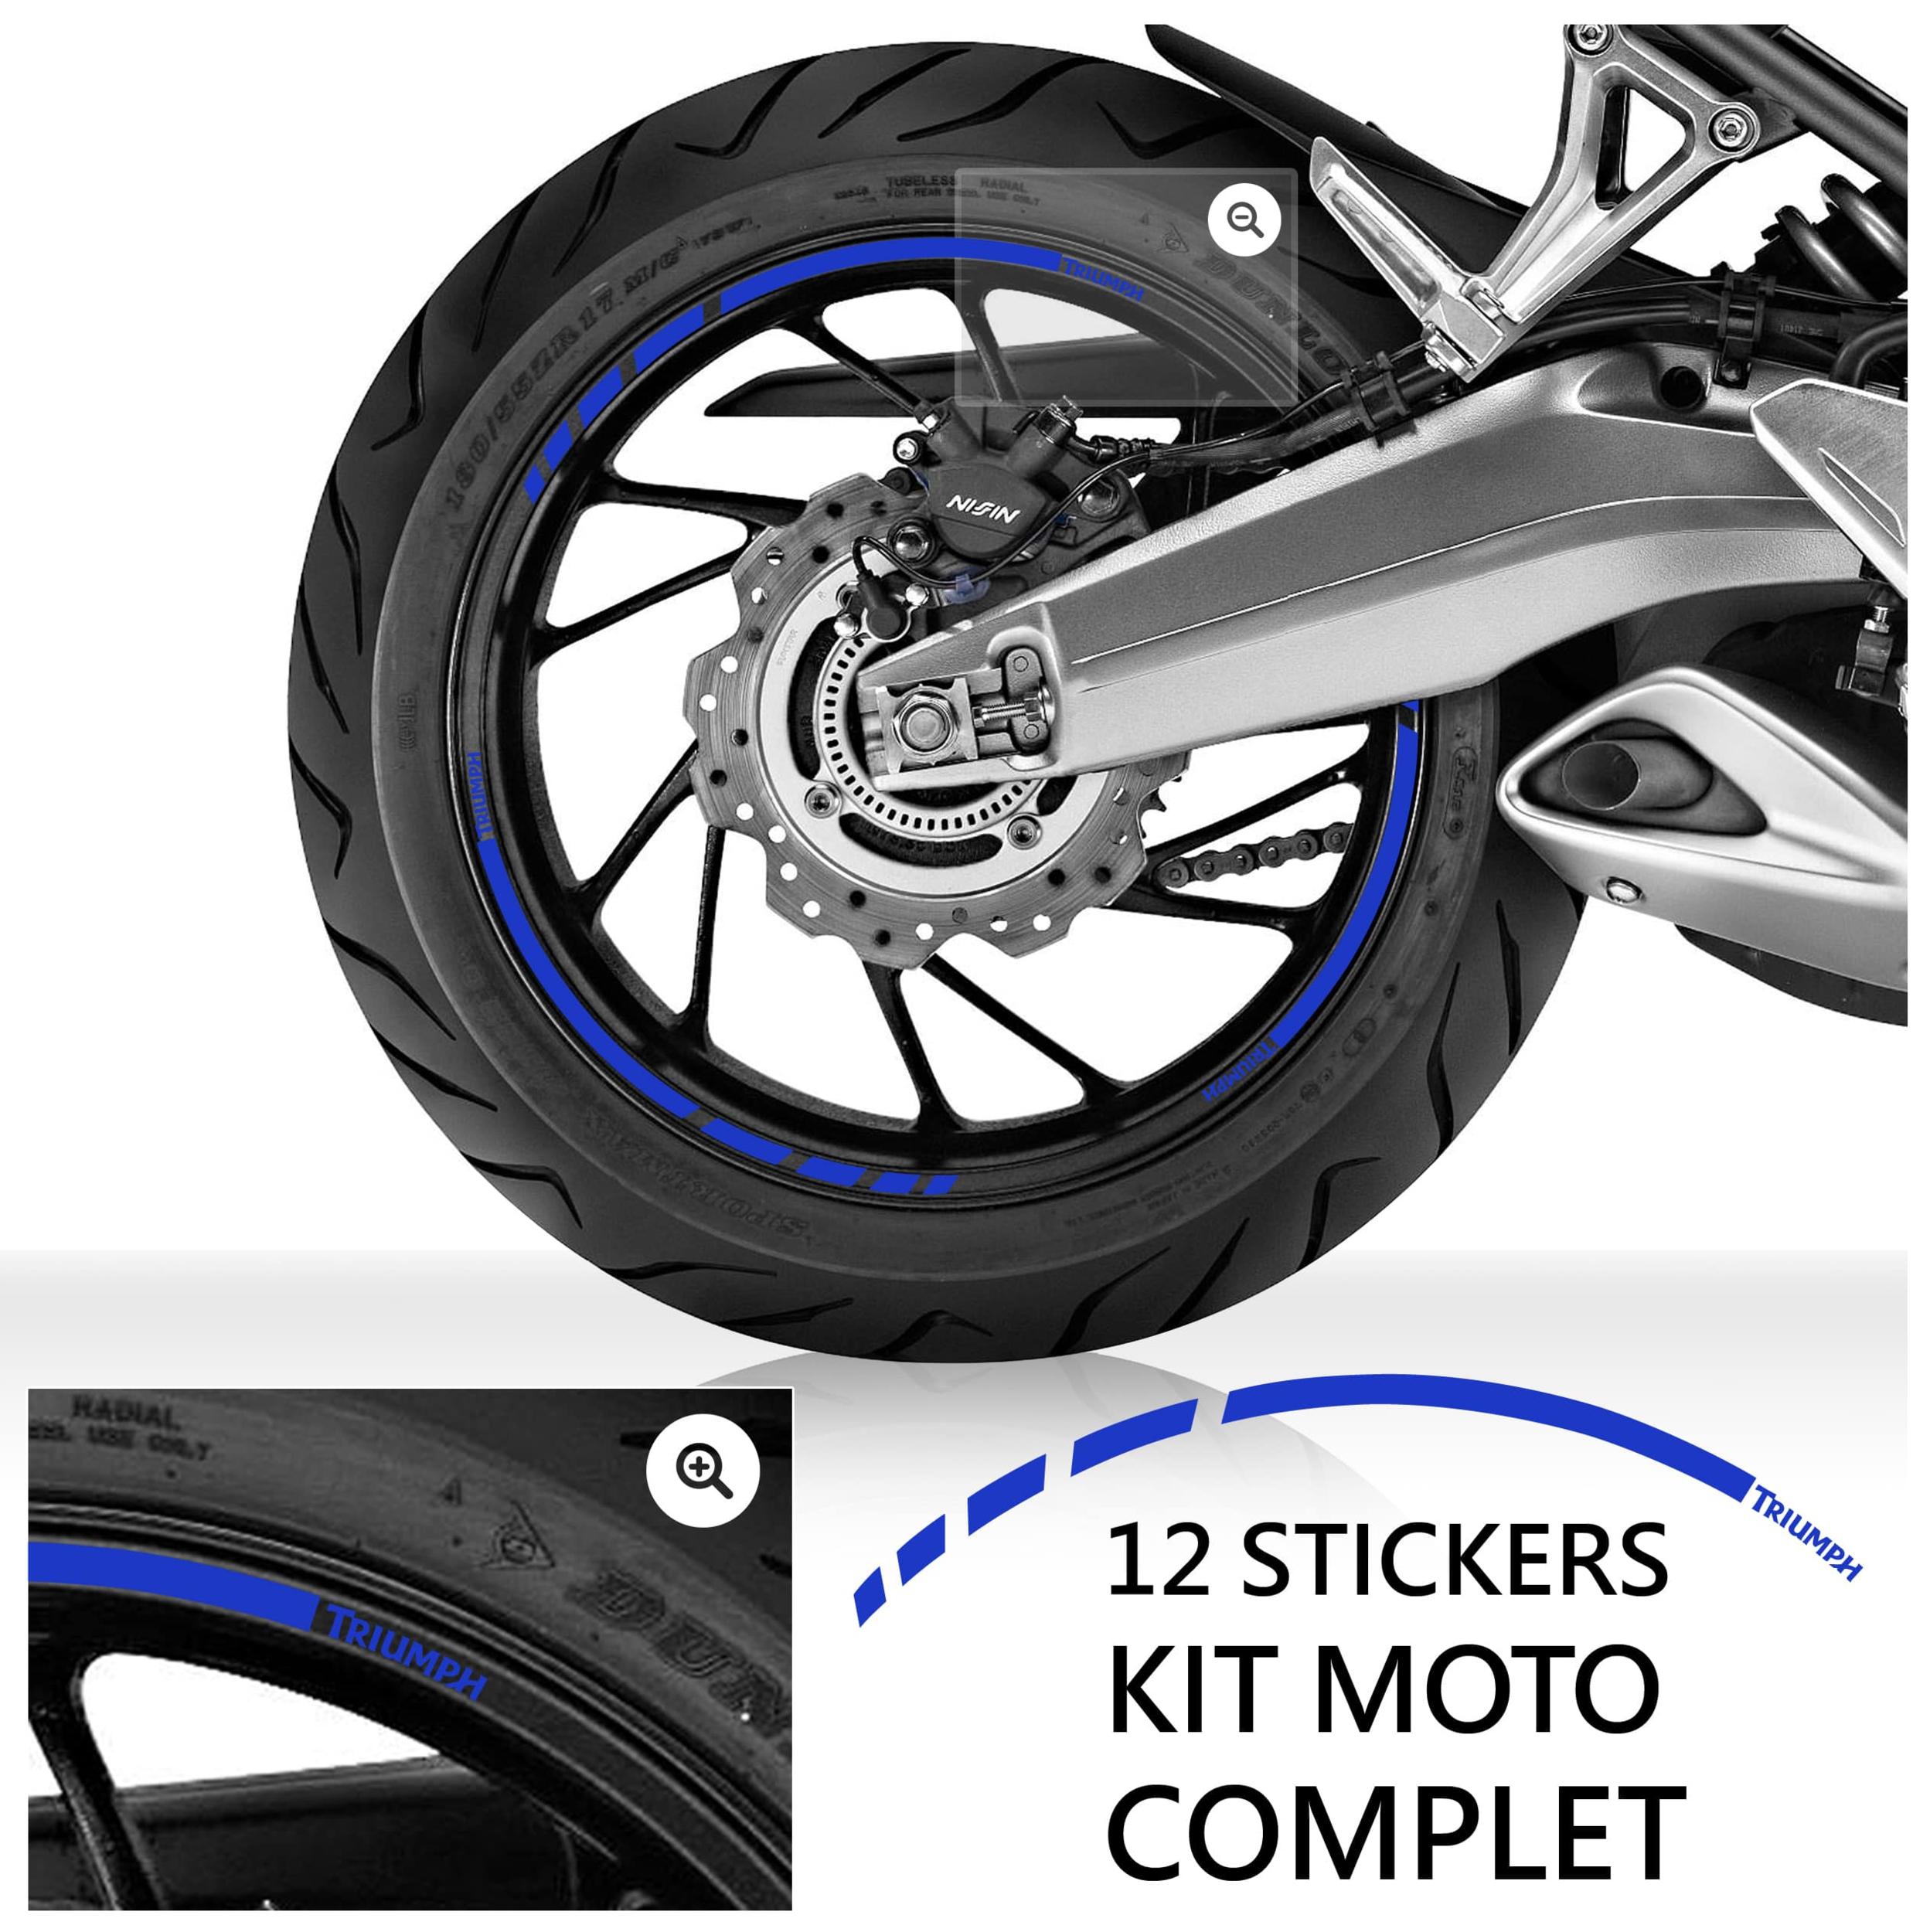 Liseret-jante-moto-triumph-ref1-stickers-autocollant-roue-scooter-kit-deco-courbe-velo-adhesif-min